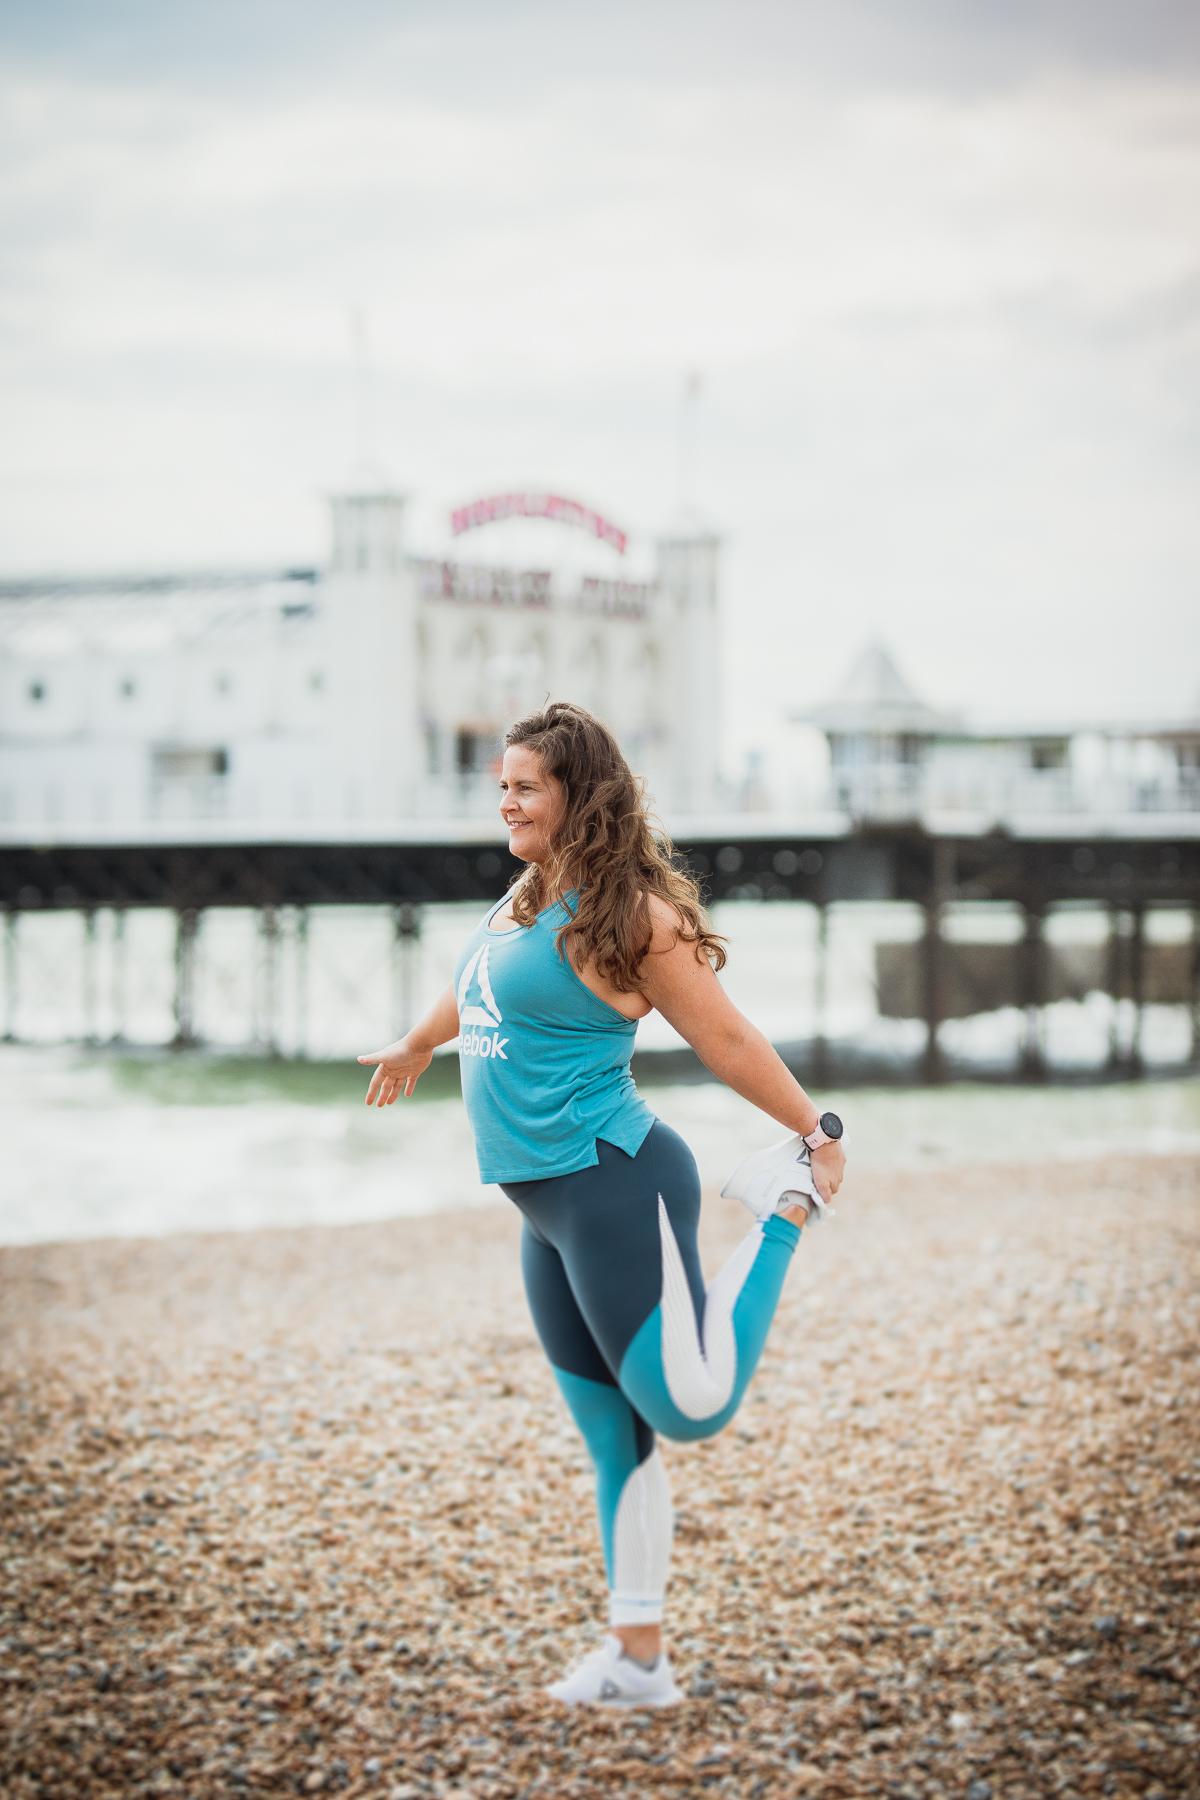 Reebok Women's Lux Block Colour Tight Brighton Beach Working Out Girl